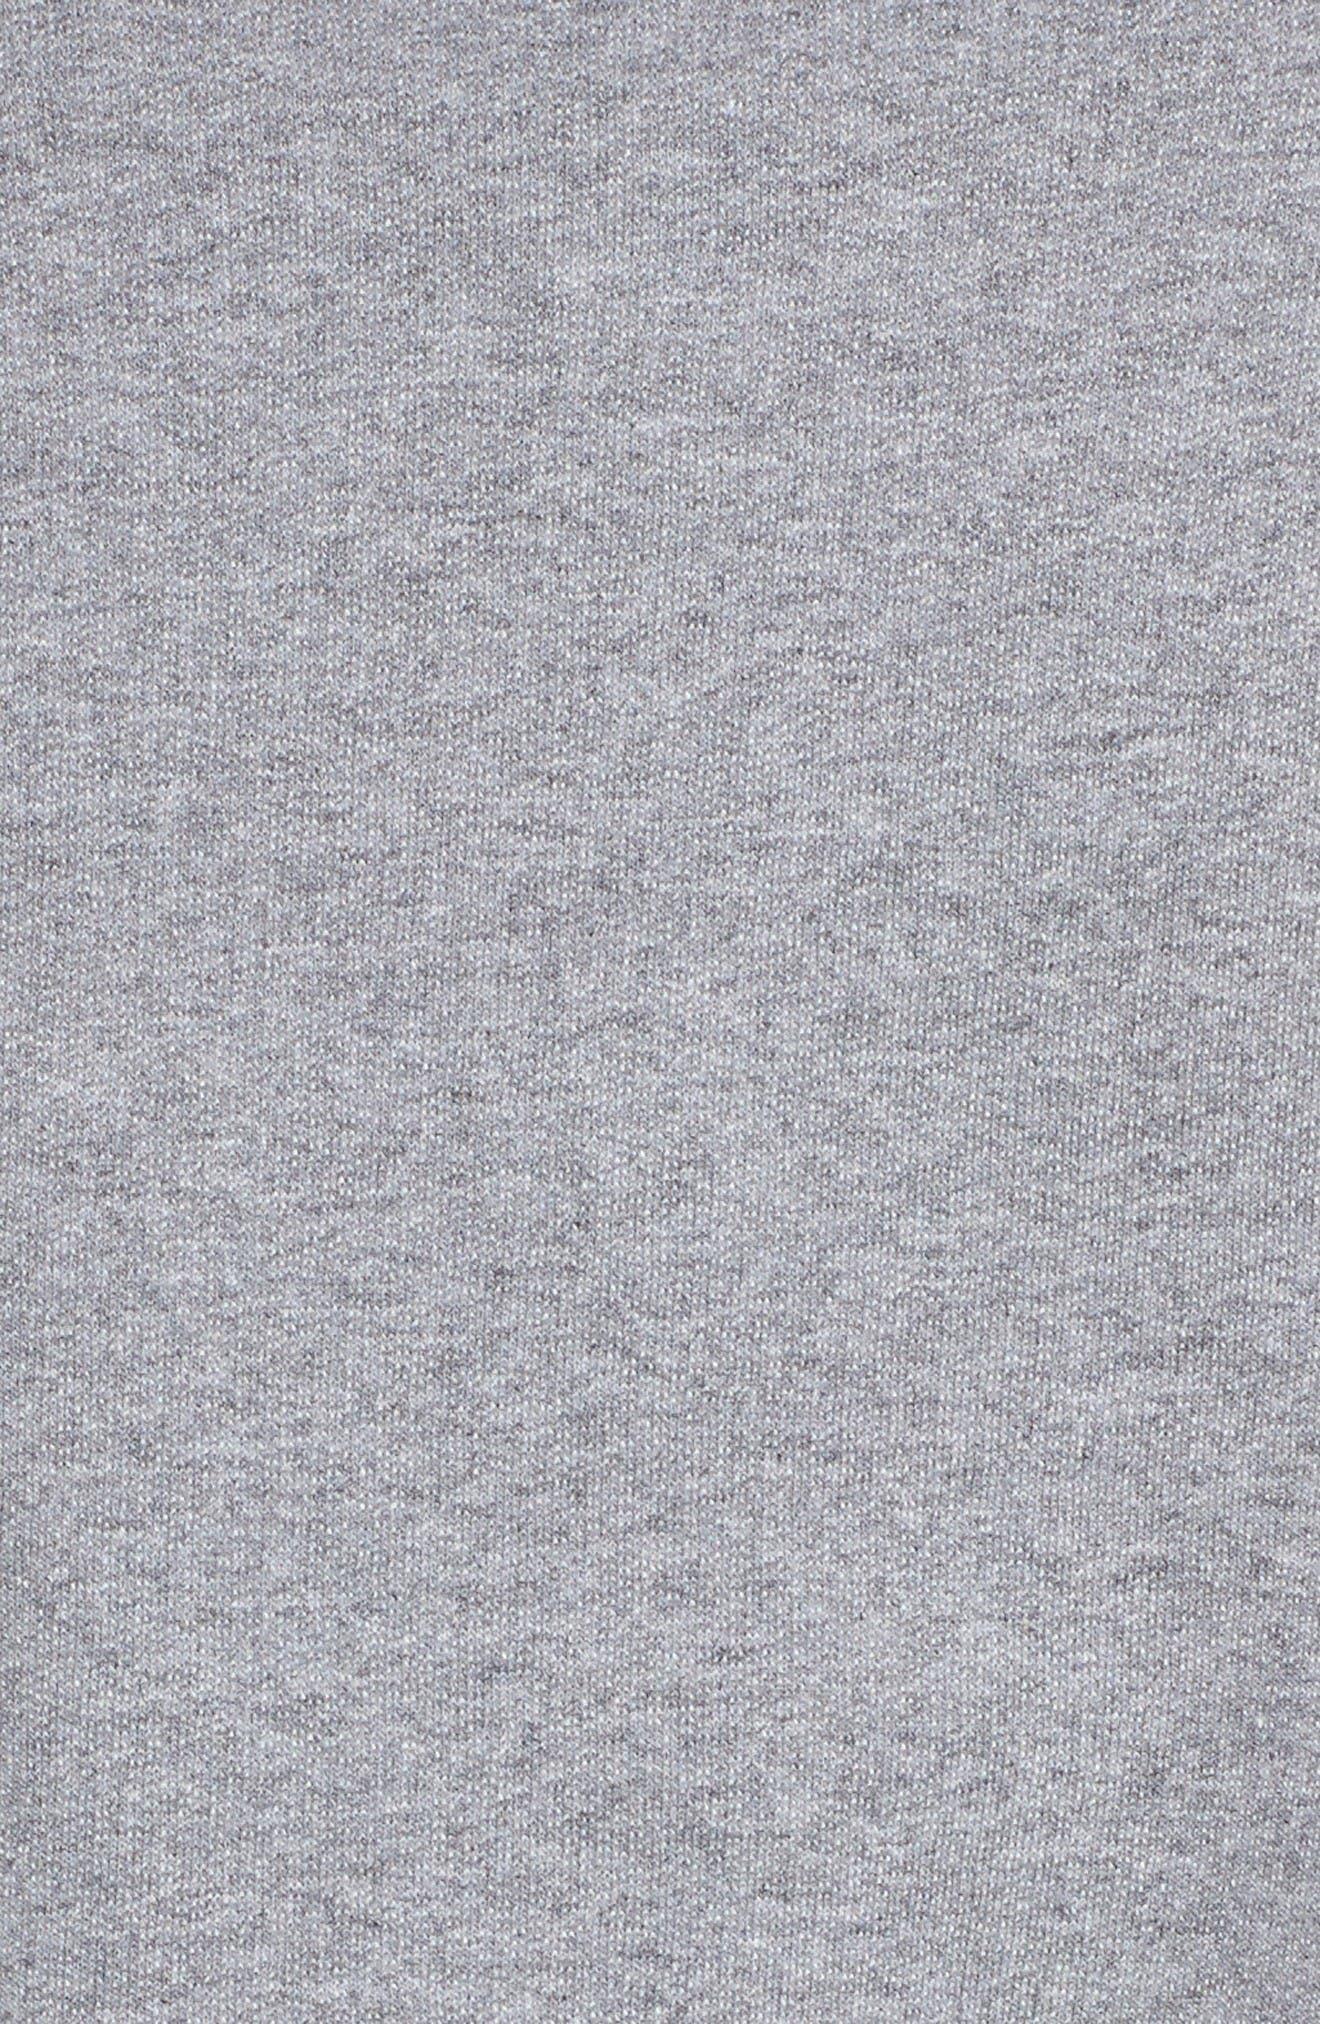 Workout Brunch Repeat Sweatshirt,                             Alternate thumbnail 6, color,                             Grey